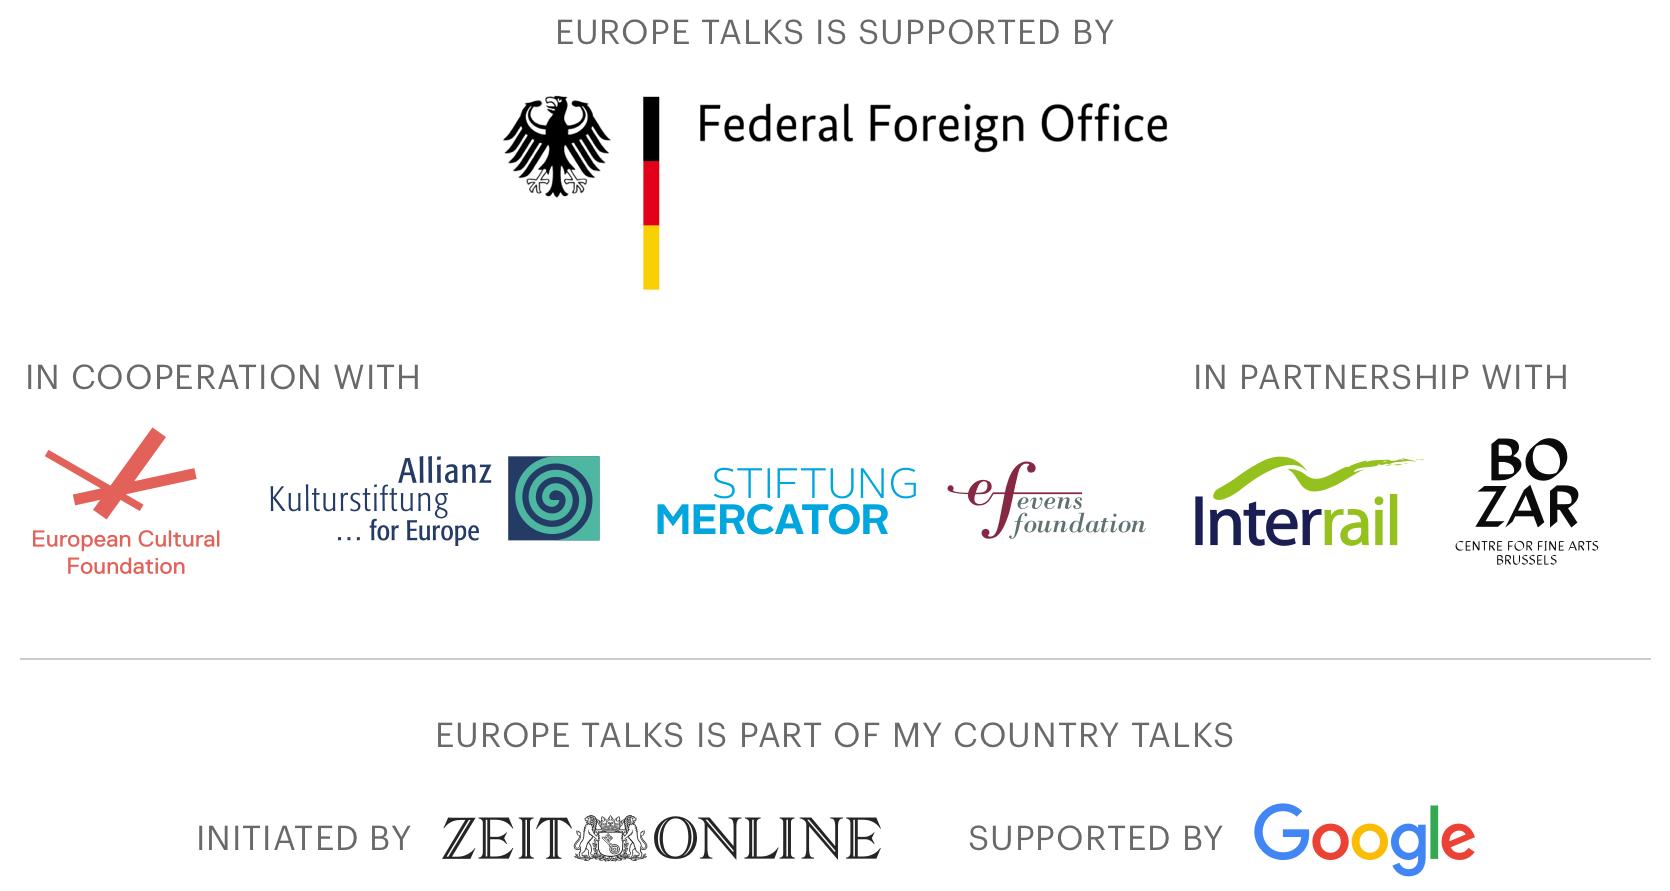 Europe-talks-logopark-compact